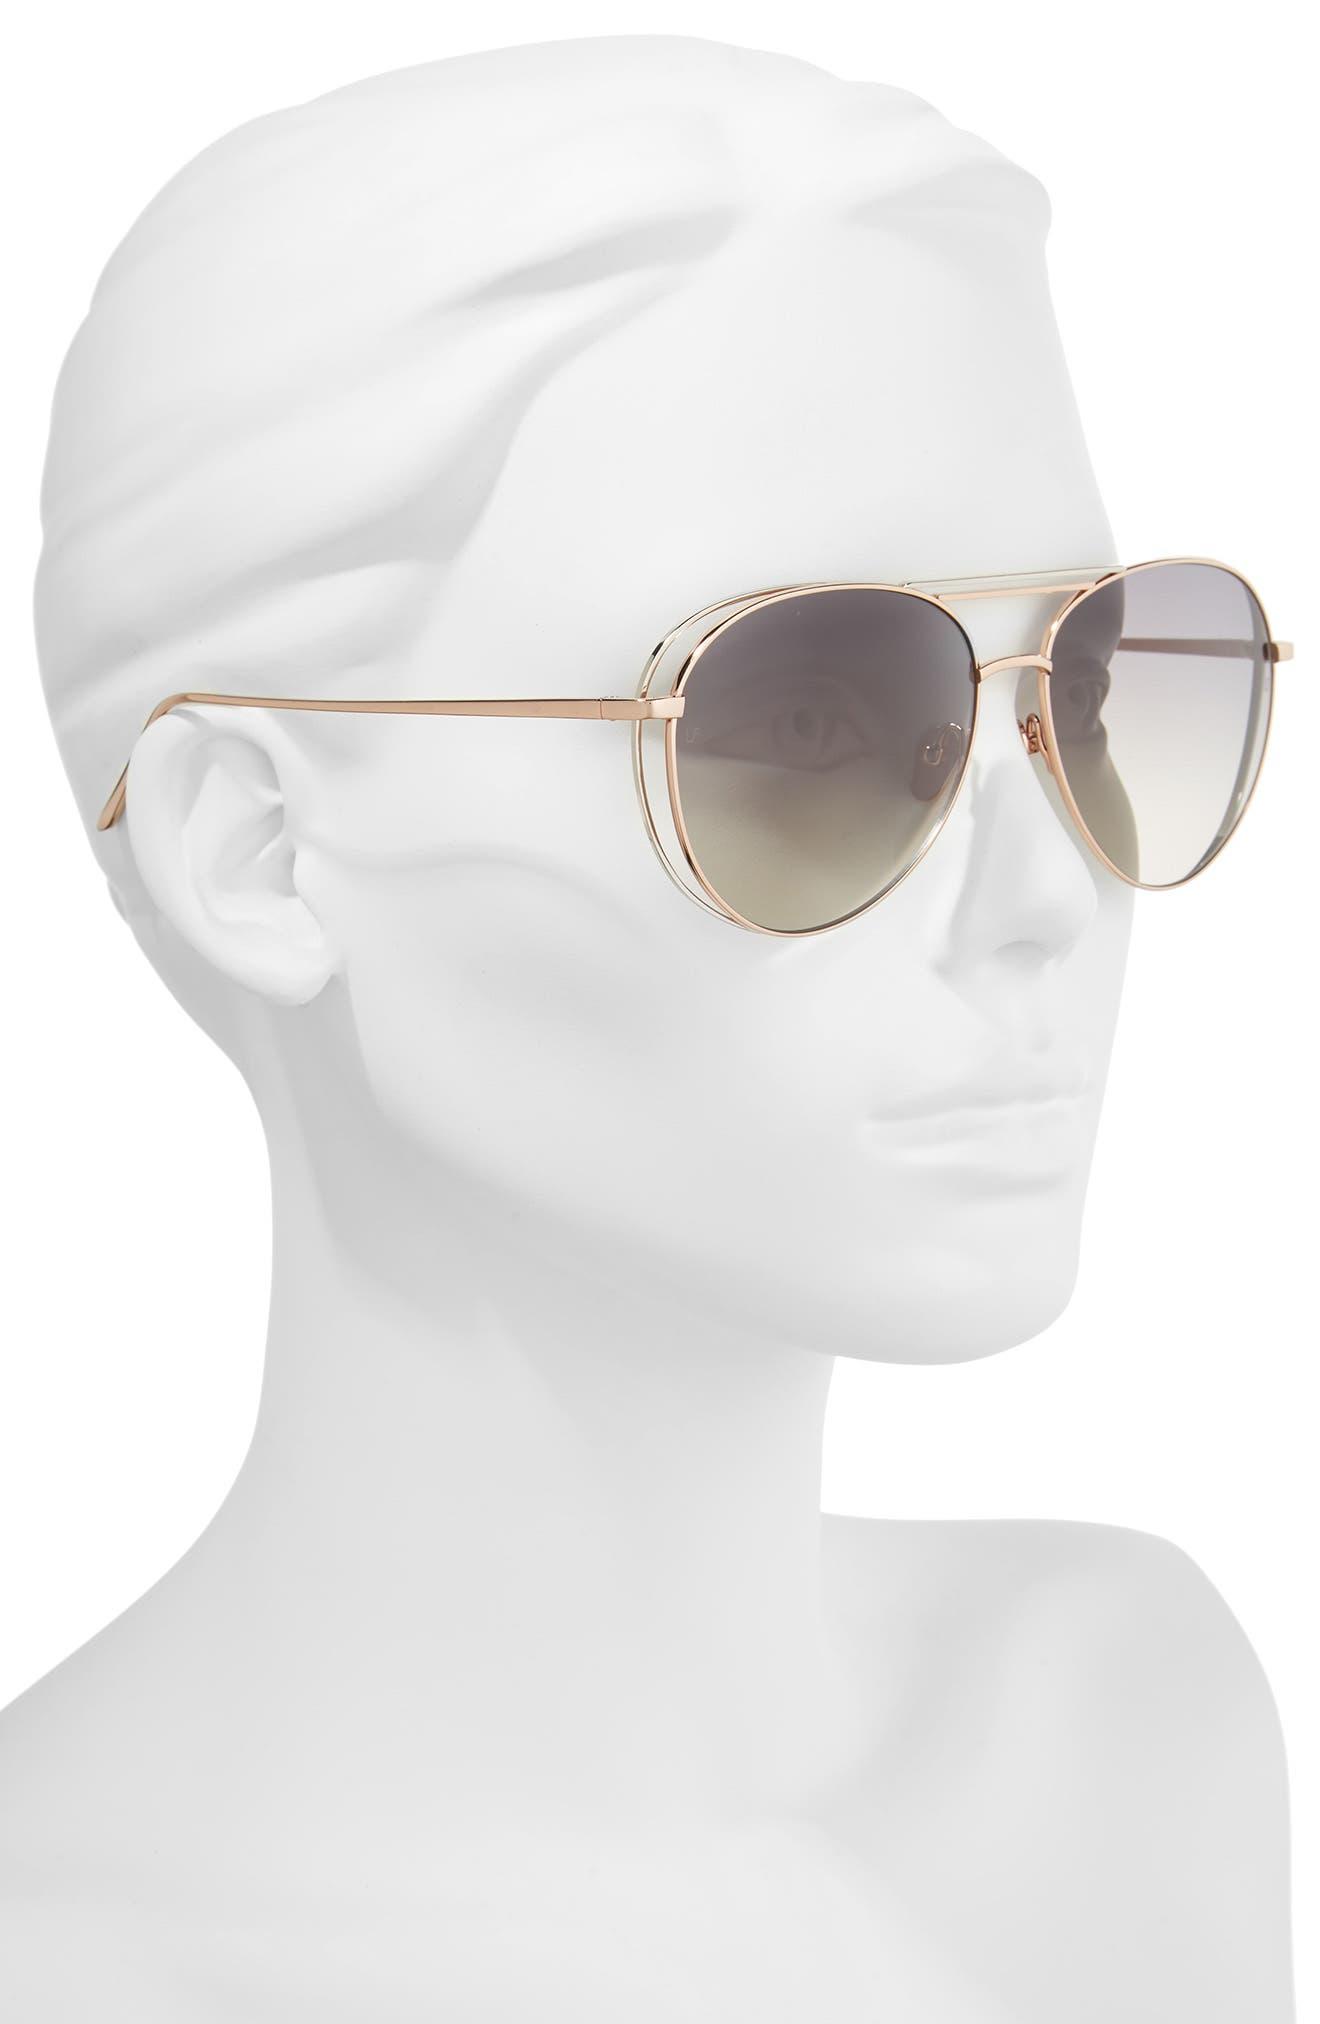 61mm 18 Karat Gold Aviator Sunglasses,                             Alternate thumbnail 6, color,